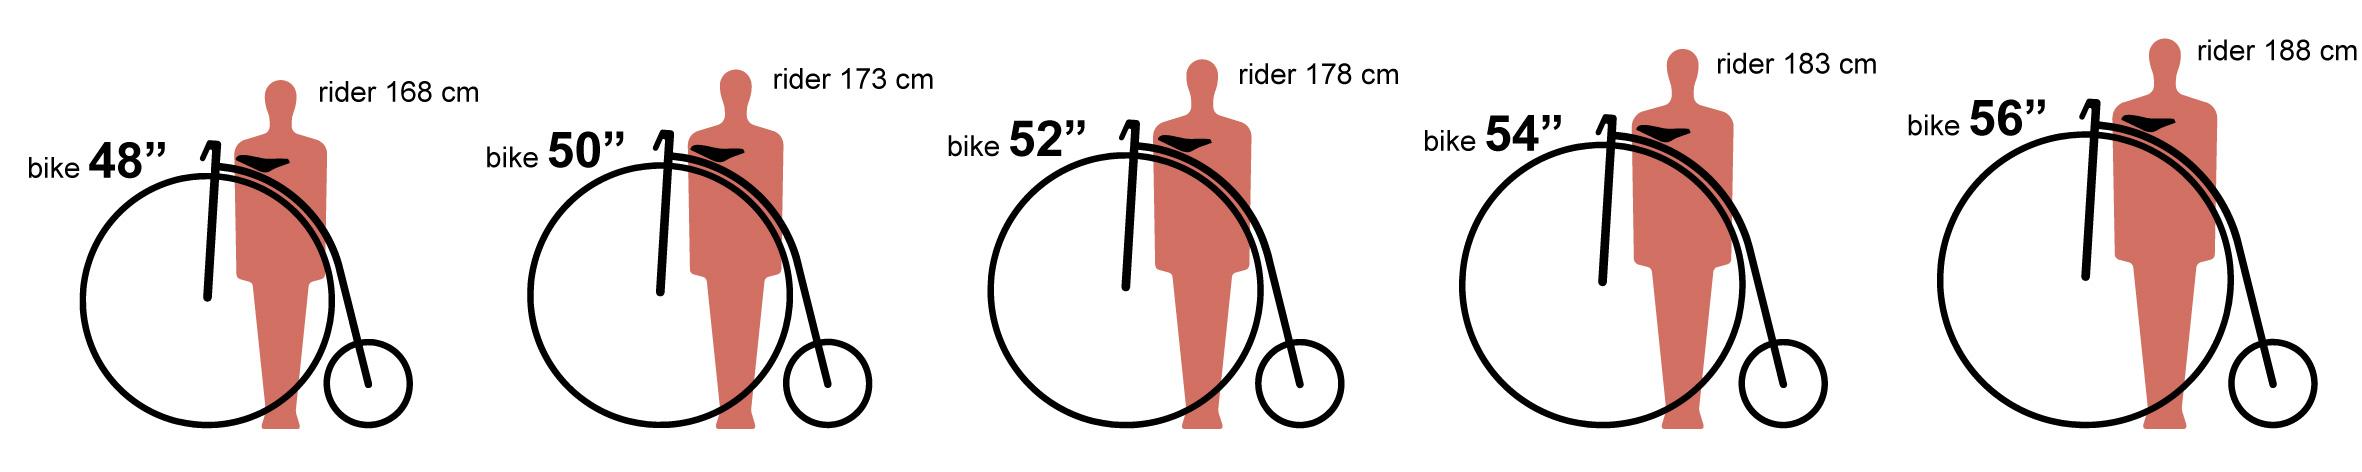 bikesize2